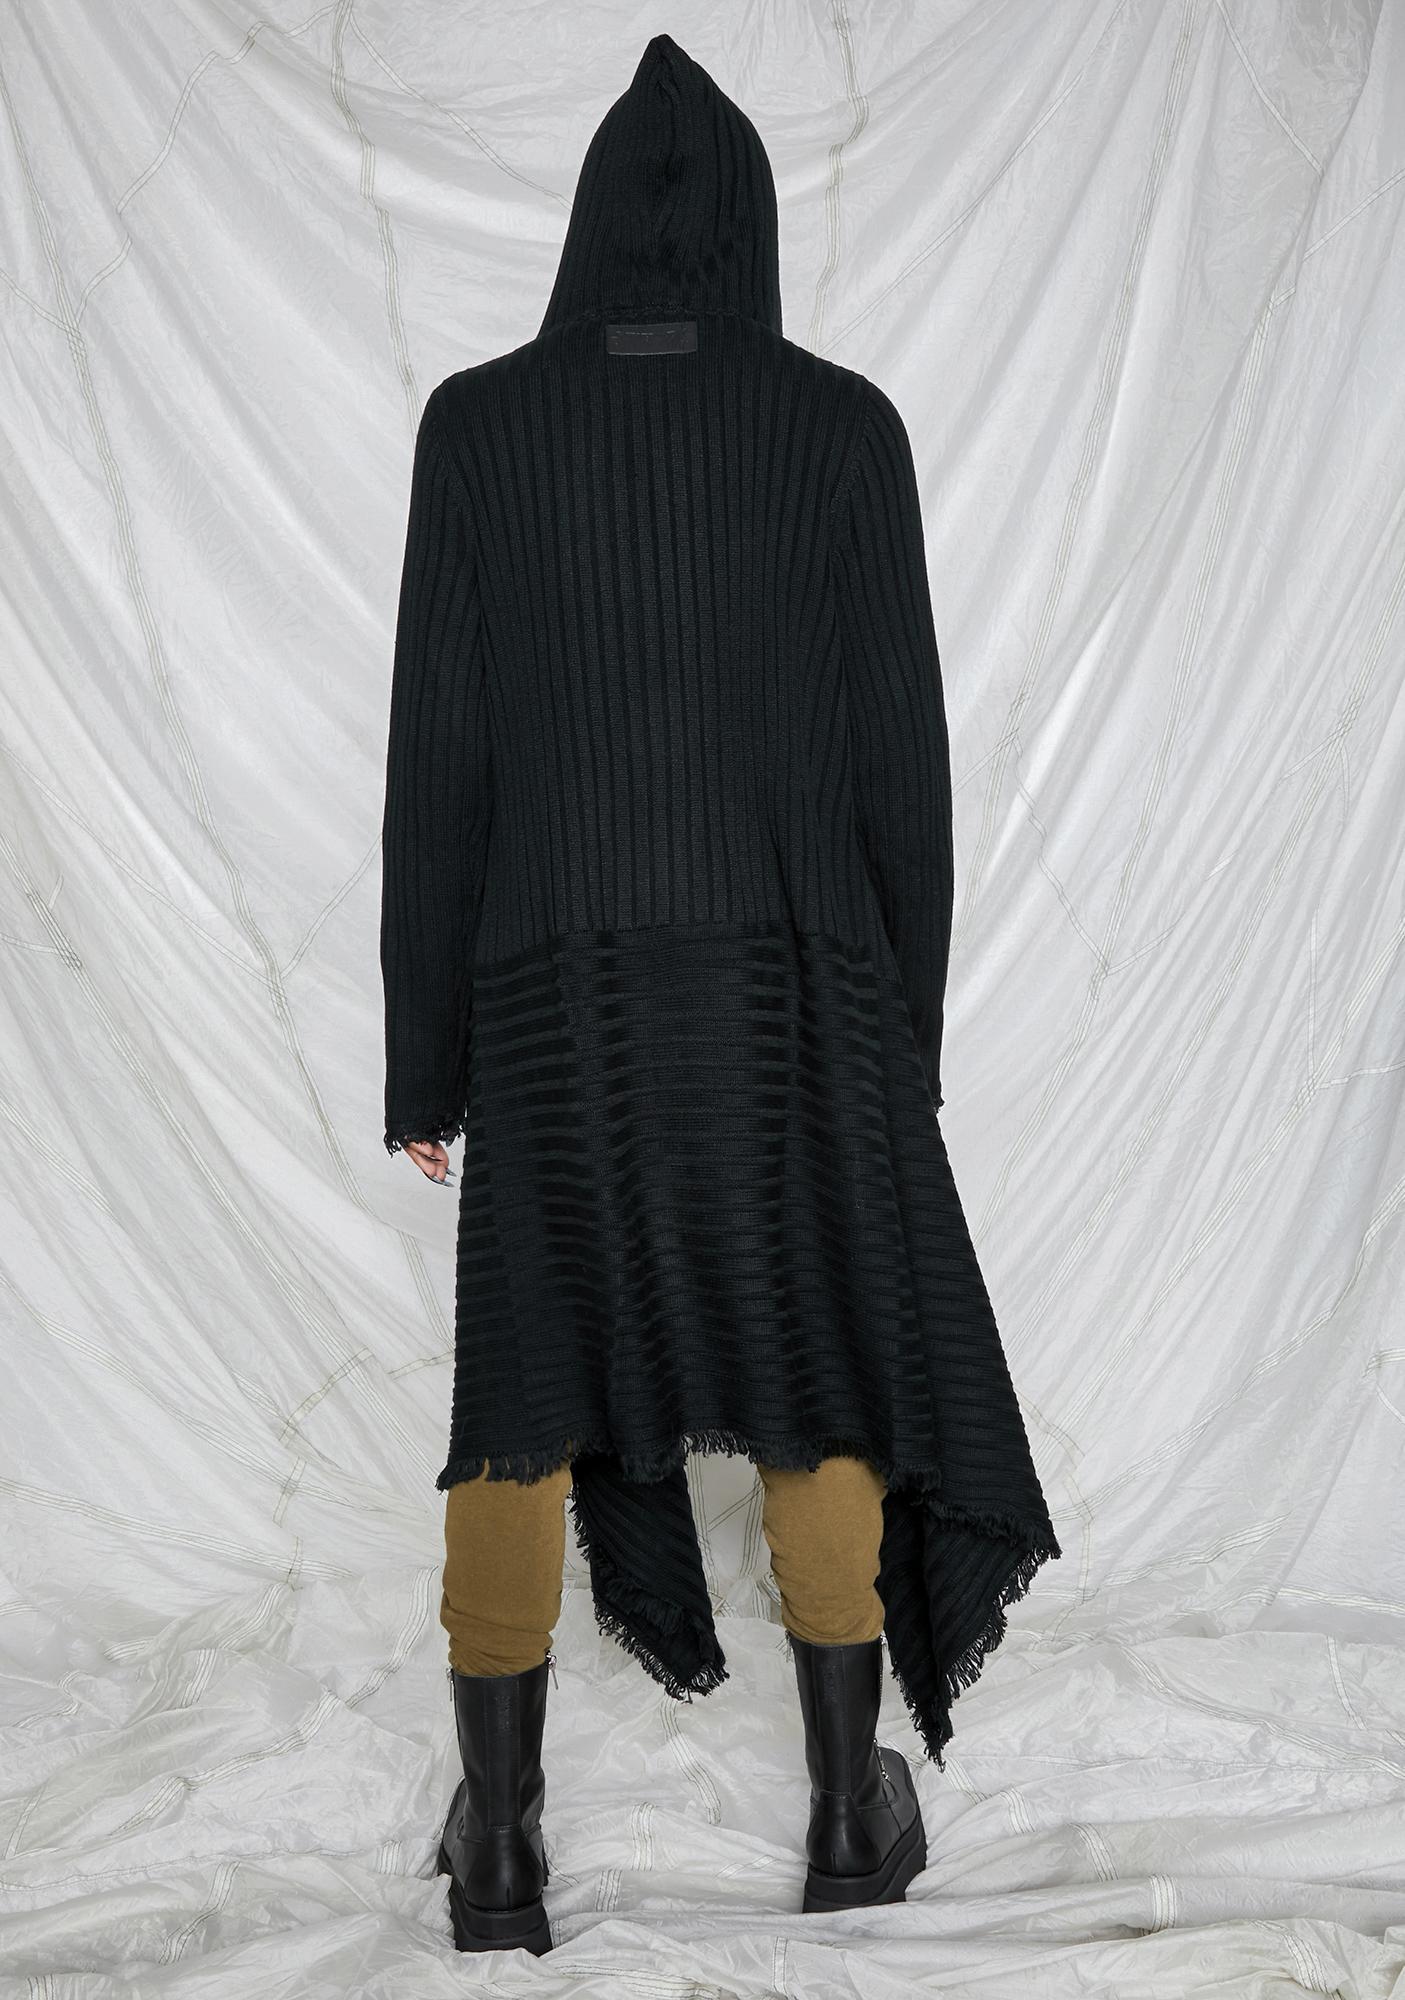 DARKER WAVS Synth Unisex Hooded Longline Cardigan